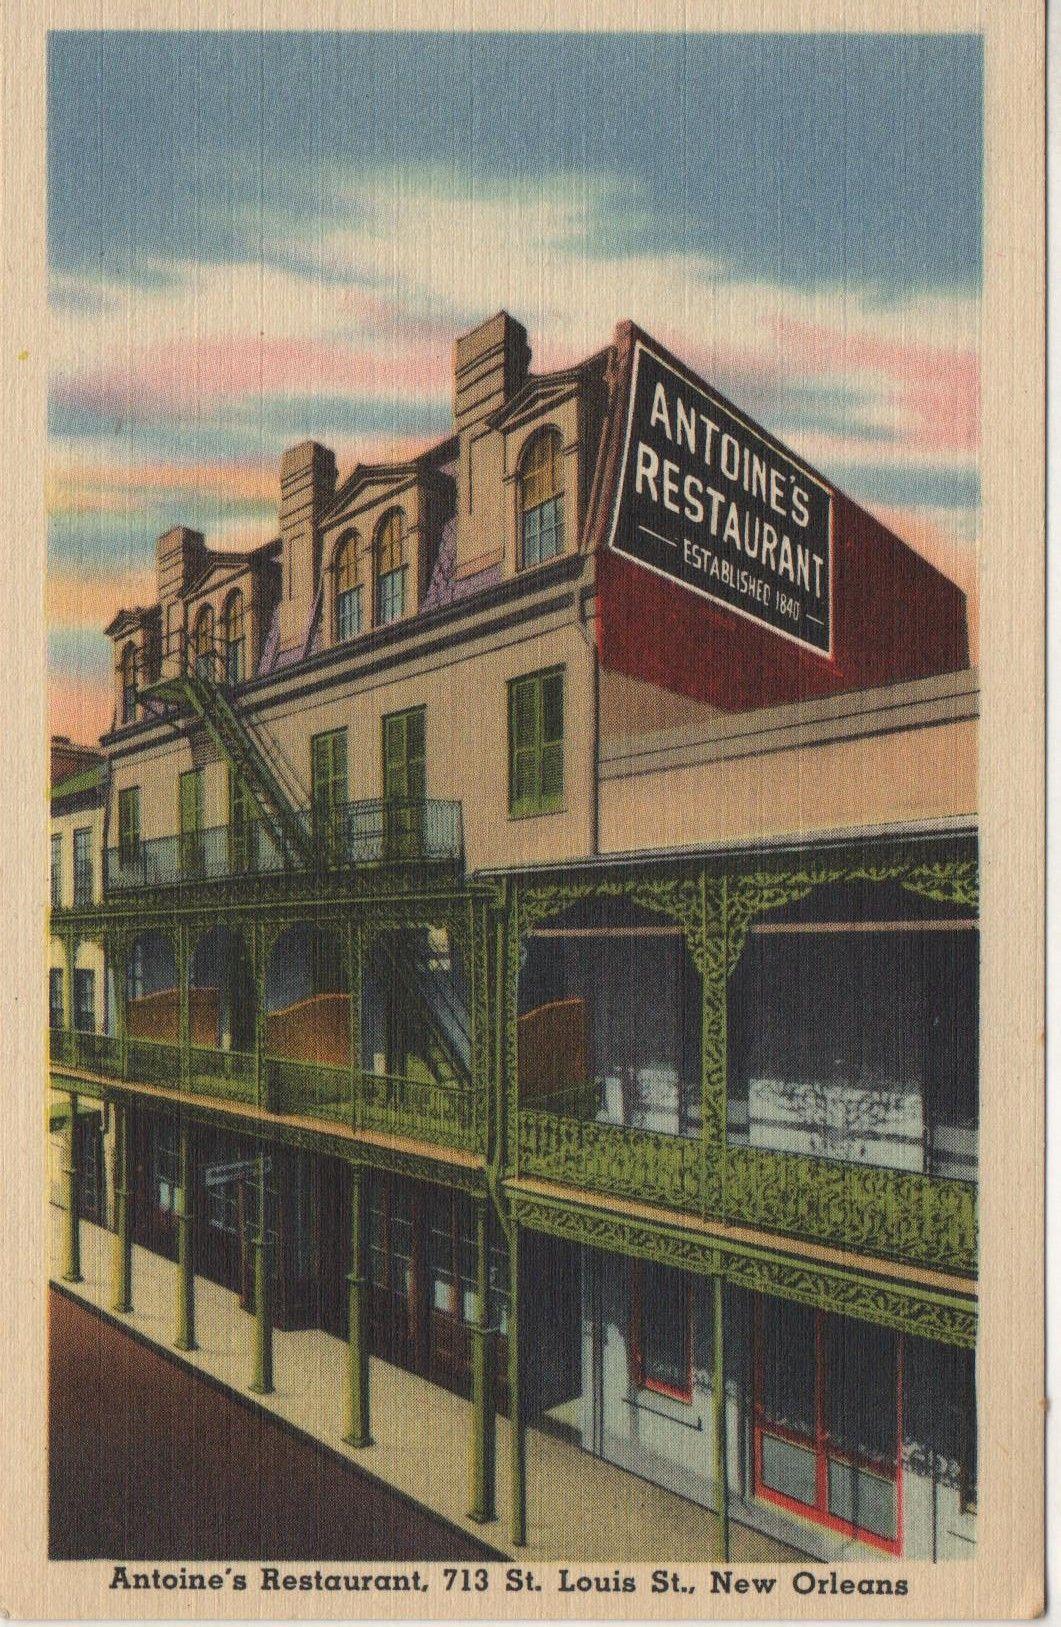 1930's Louisiana Postcard. Hagins collection. New